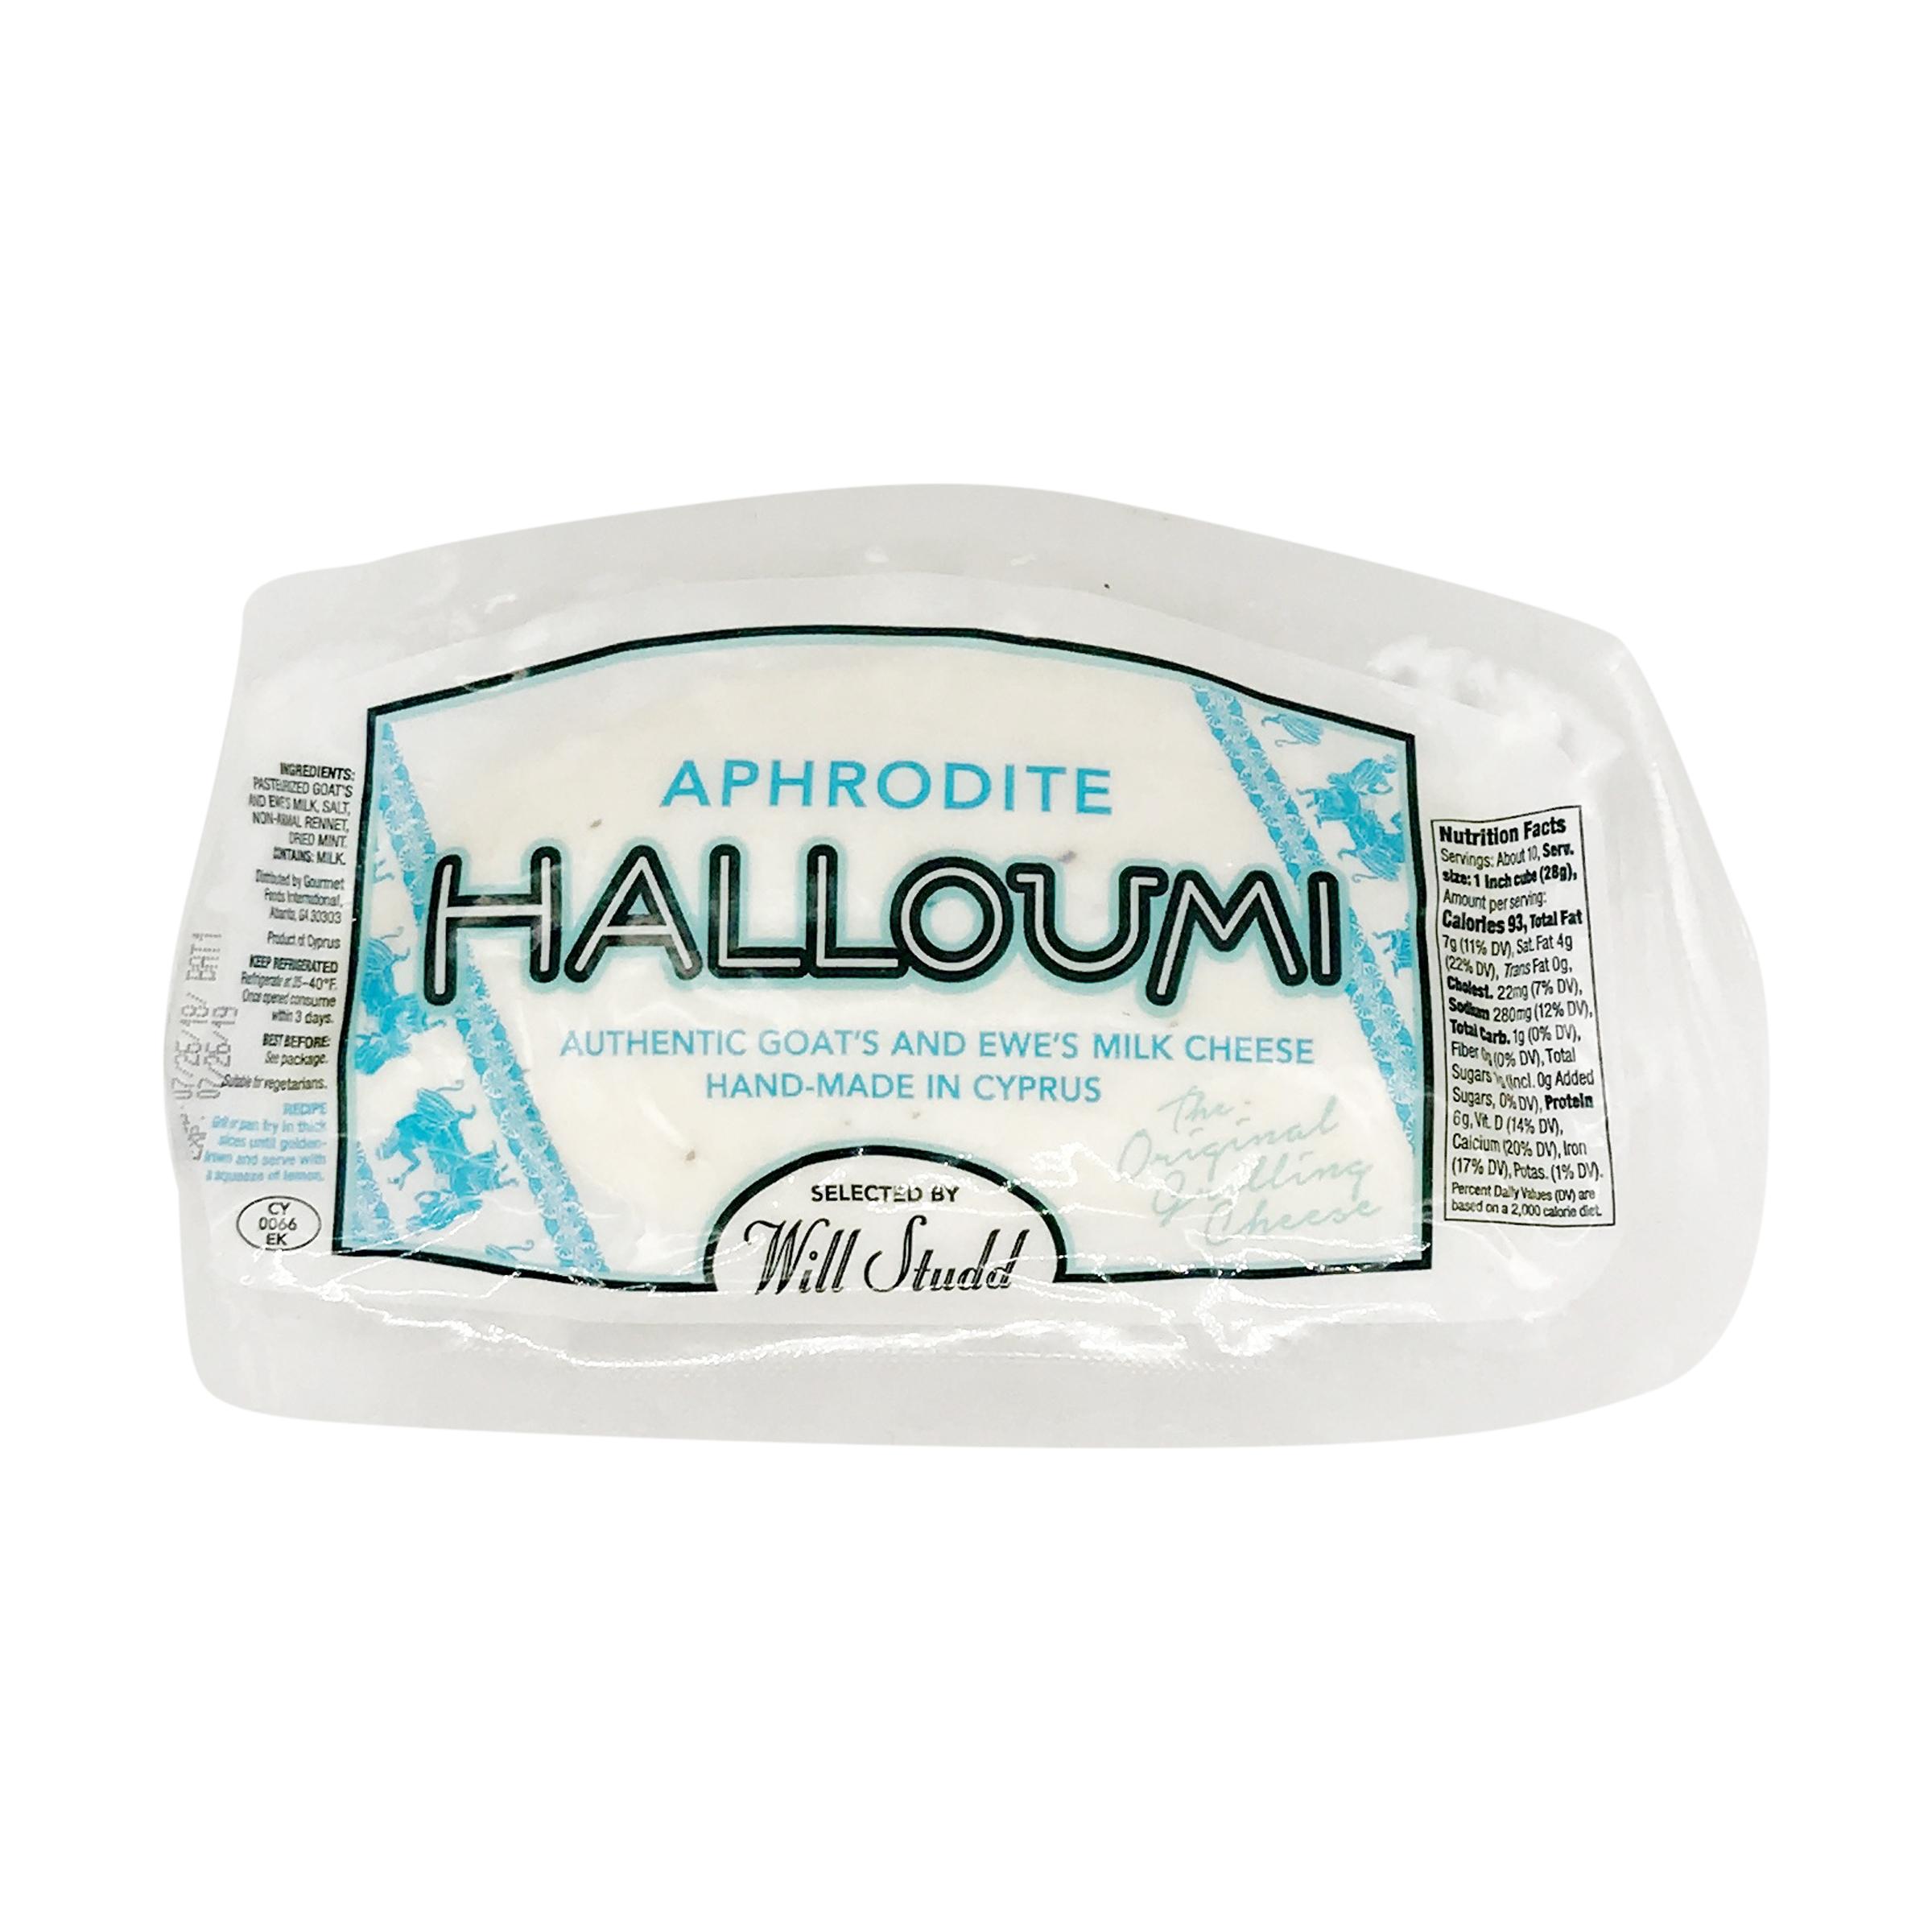 Bar De Putas halloumi aphrodite, 1 lb, will studd | whole foods market